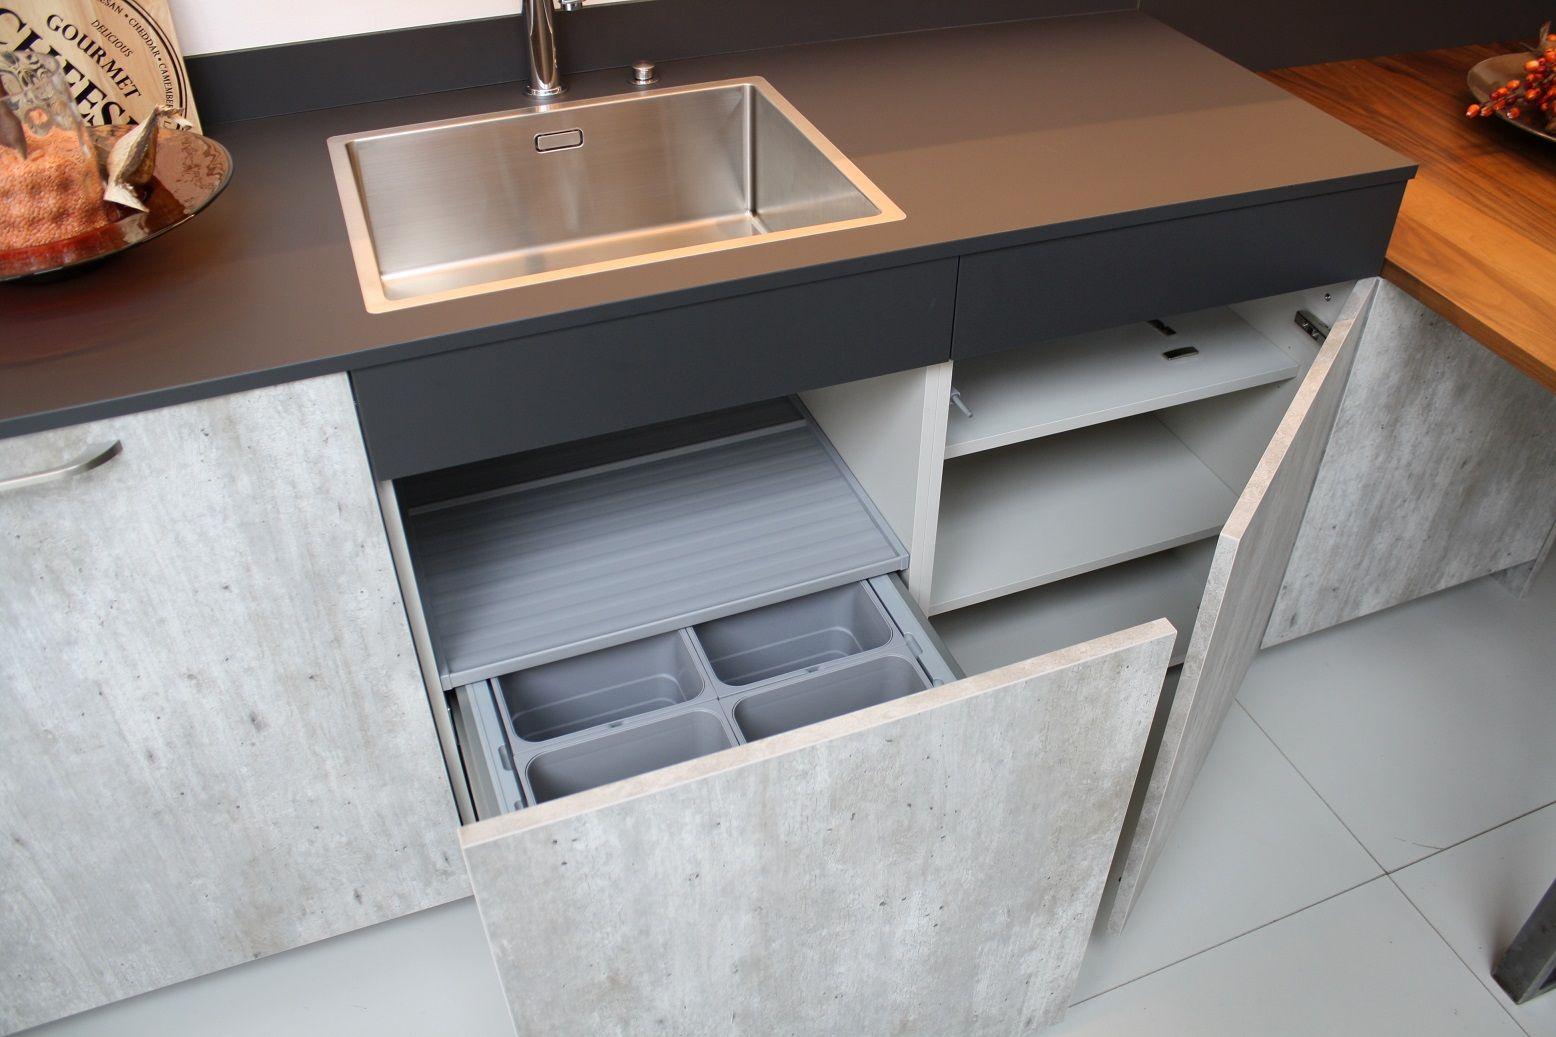 Kastenwand Keuken Hoogte : Allergrootste keukensite van Nederland Prachtige keuken 15.6 [55276